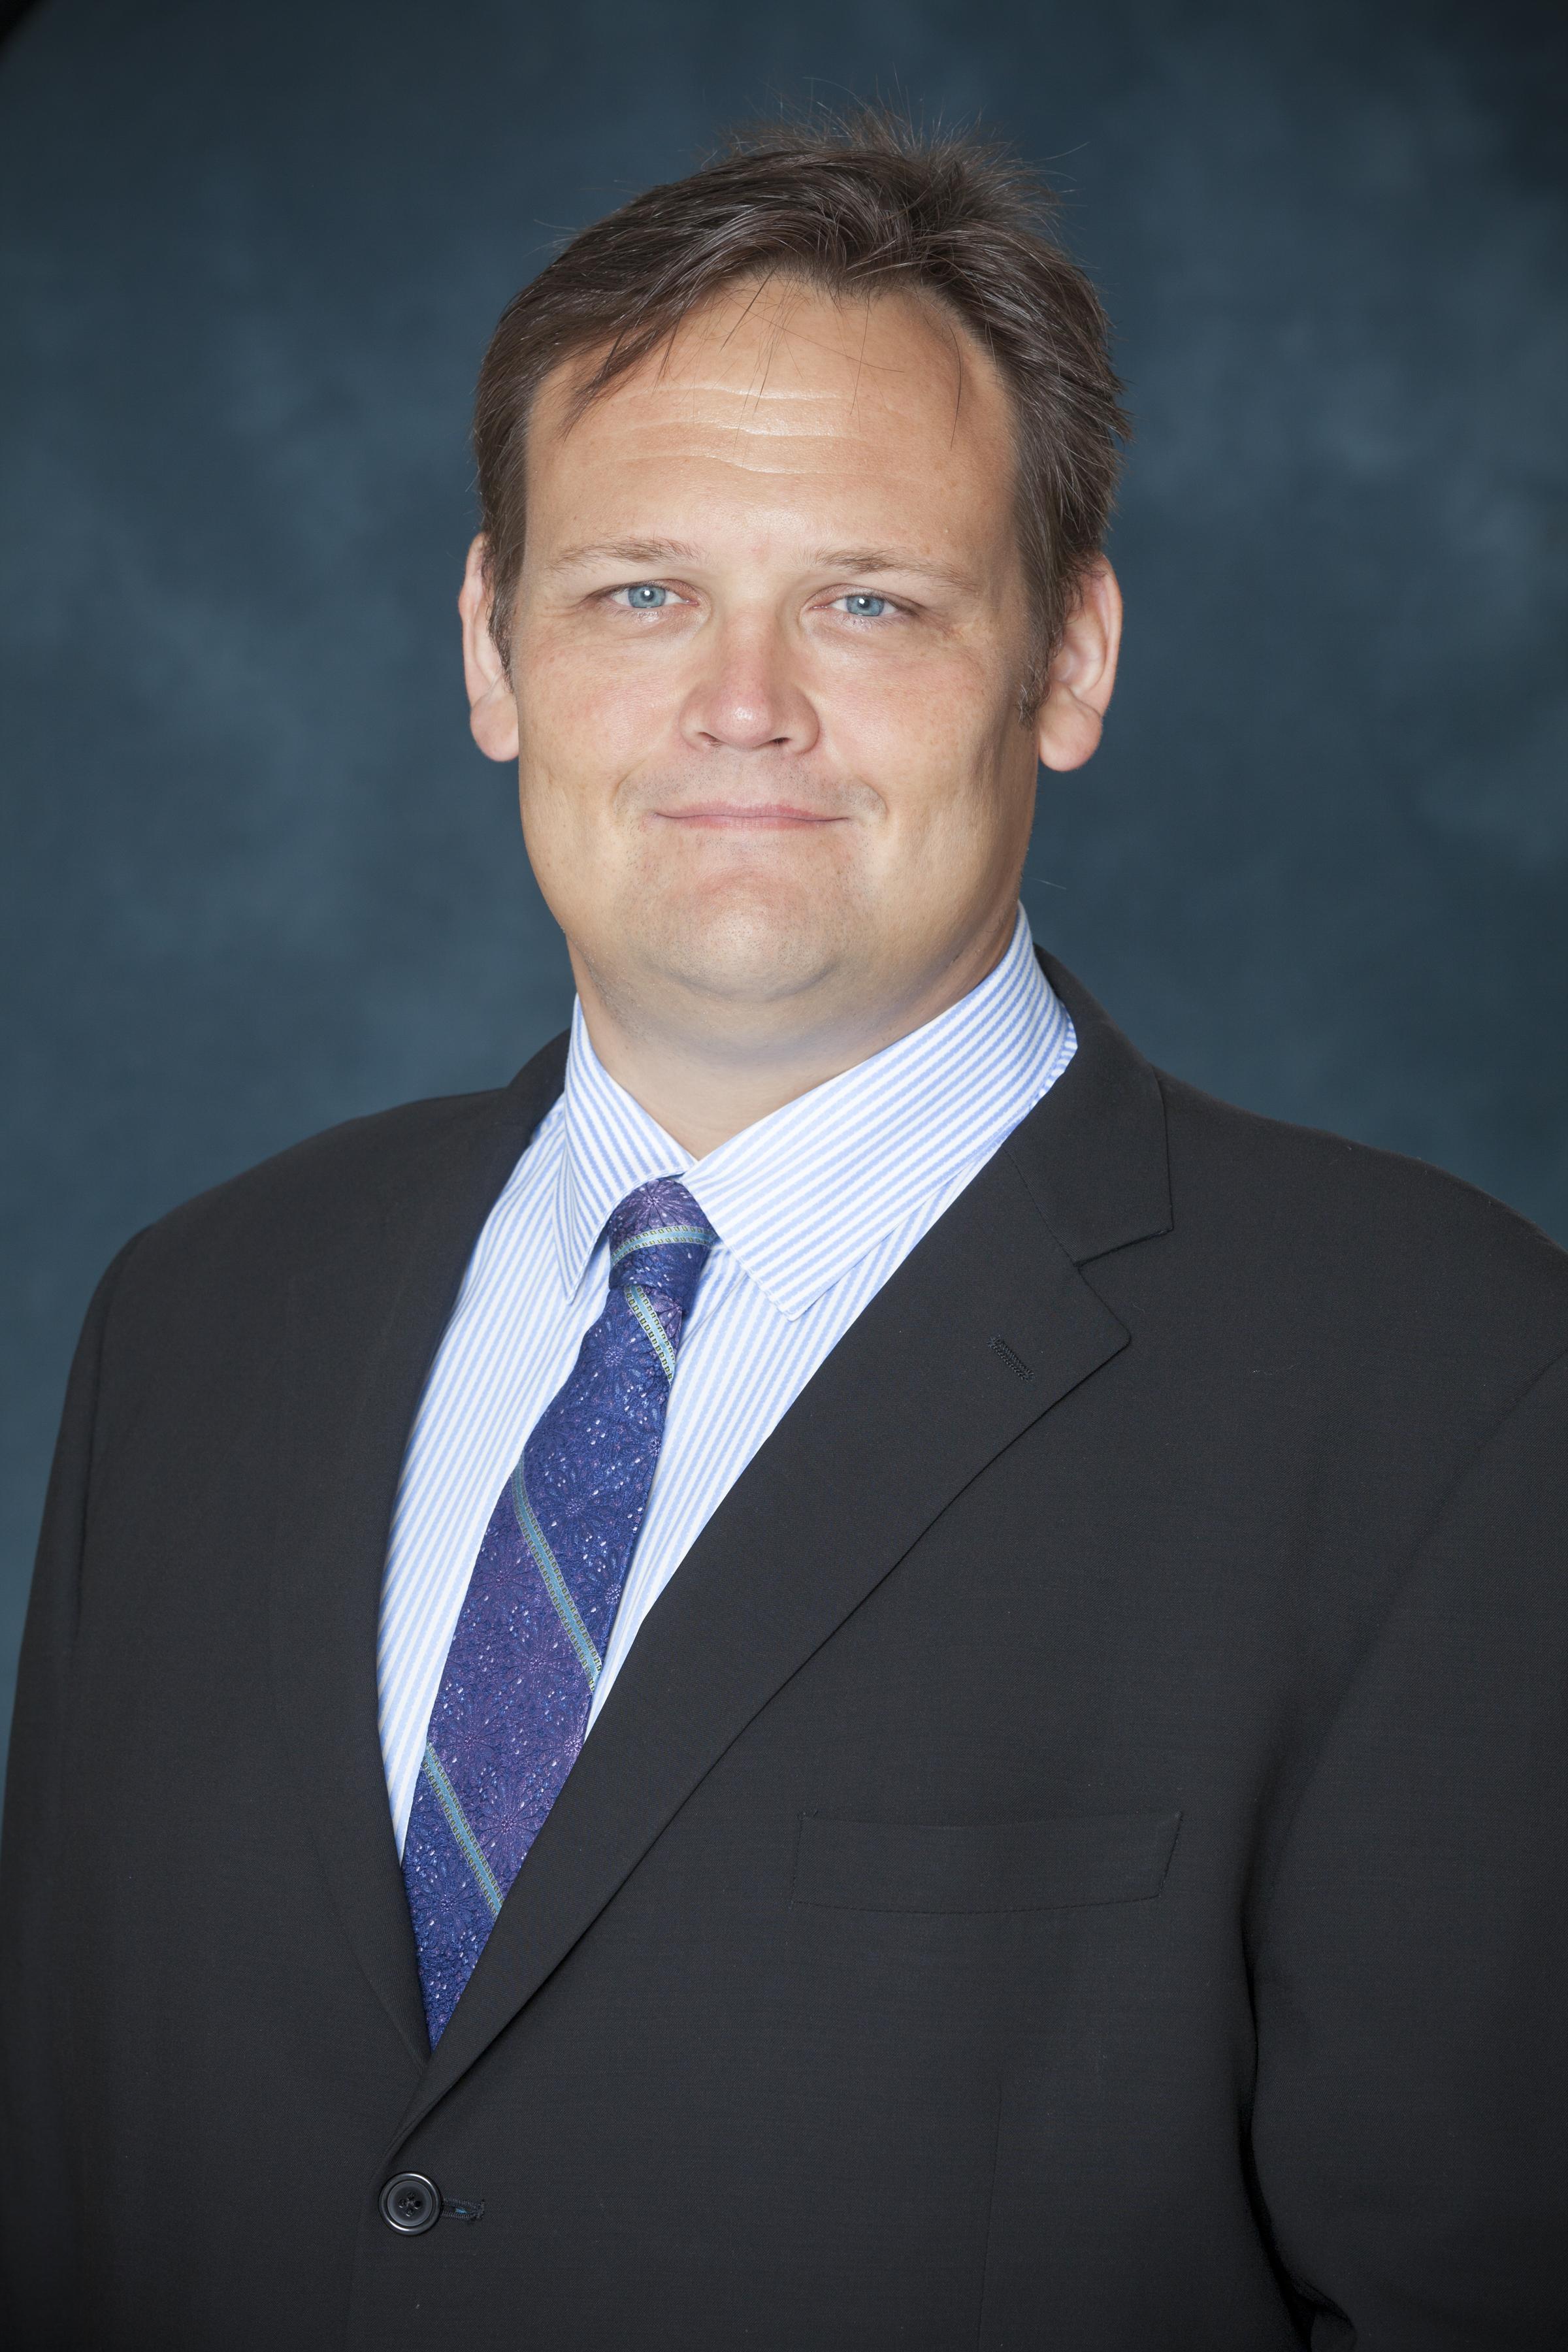 Eeric Truumees, MD